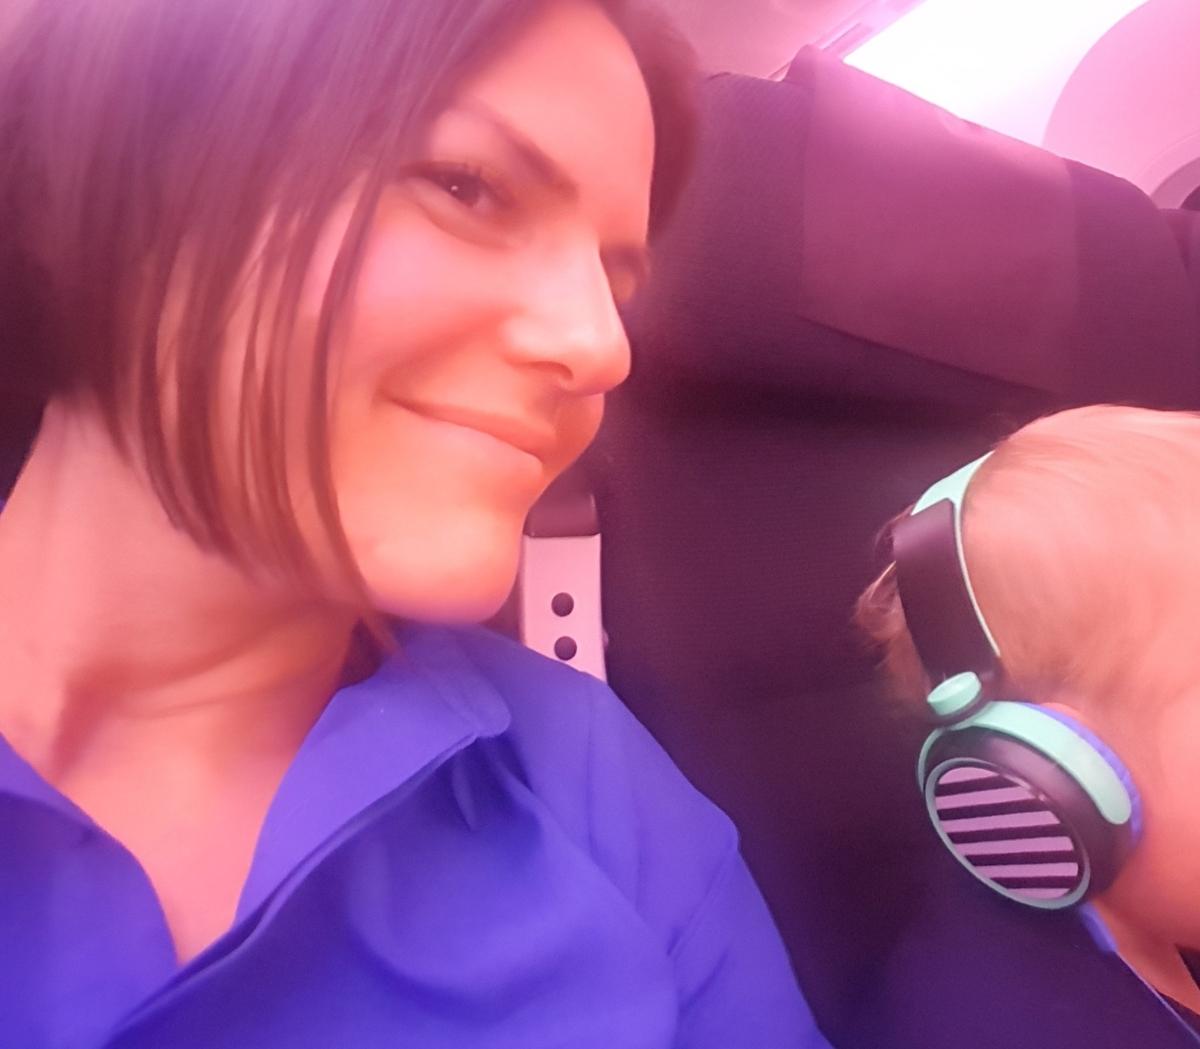 Eva on the Plane